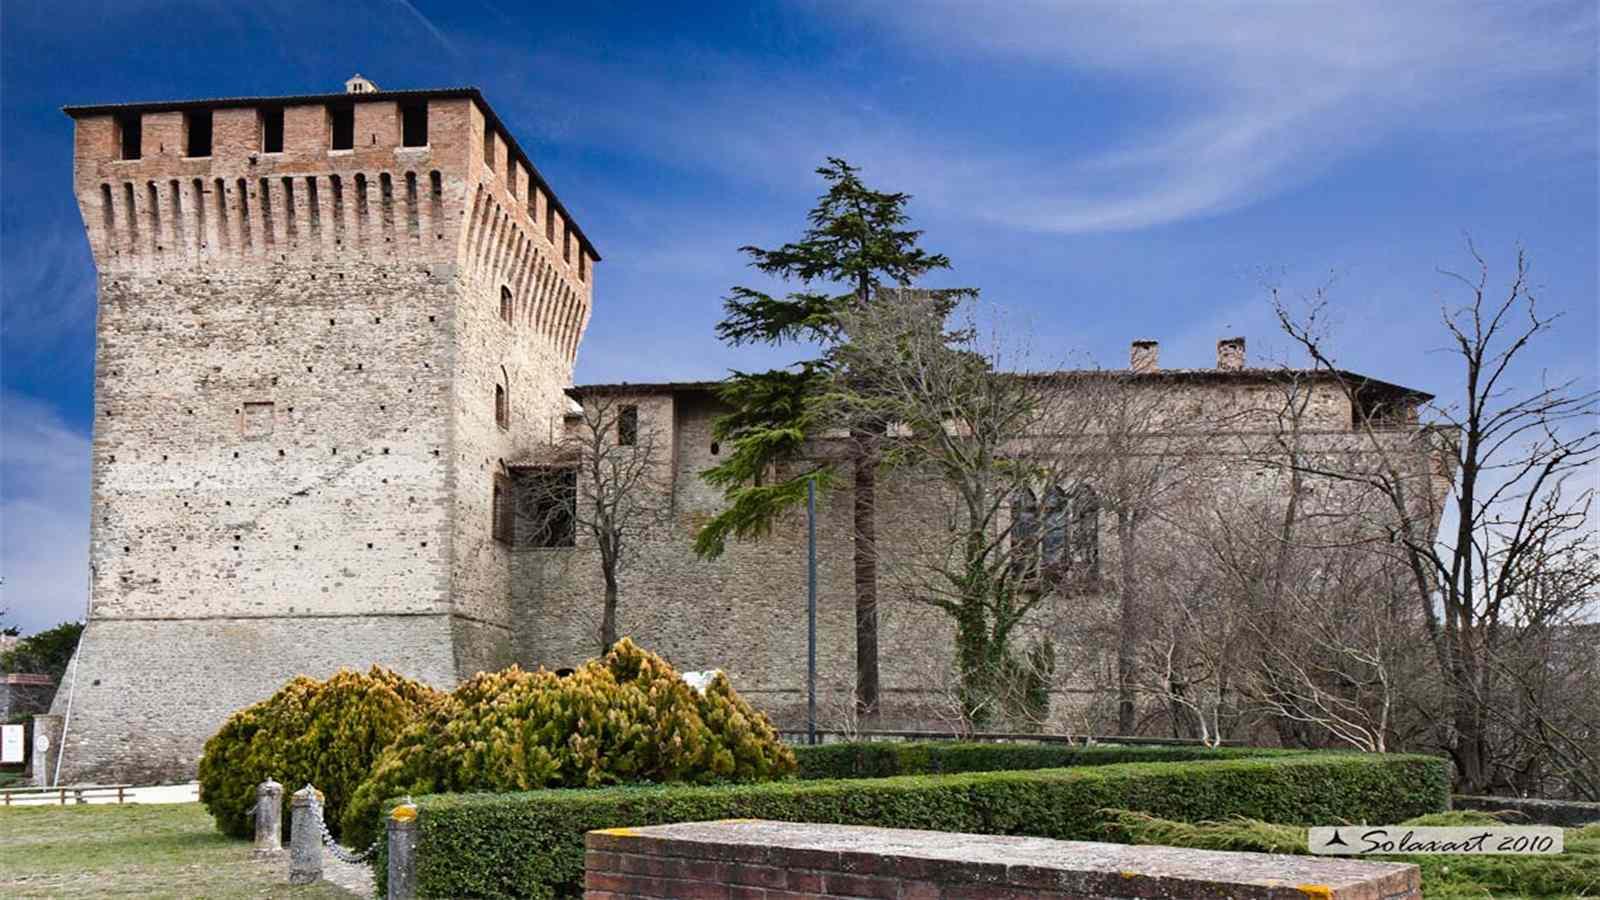 Castello Pallavicino - Varano de' Melegari